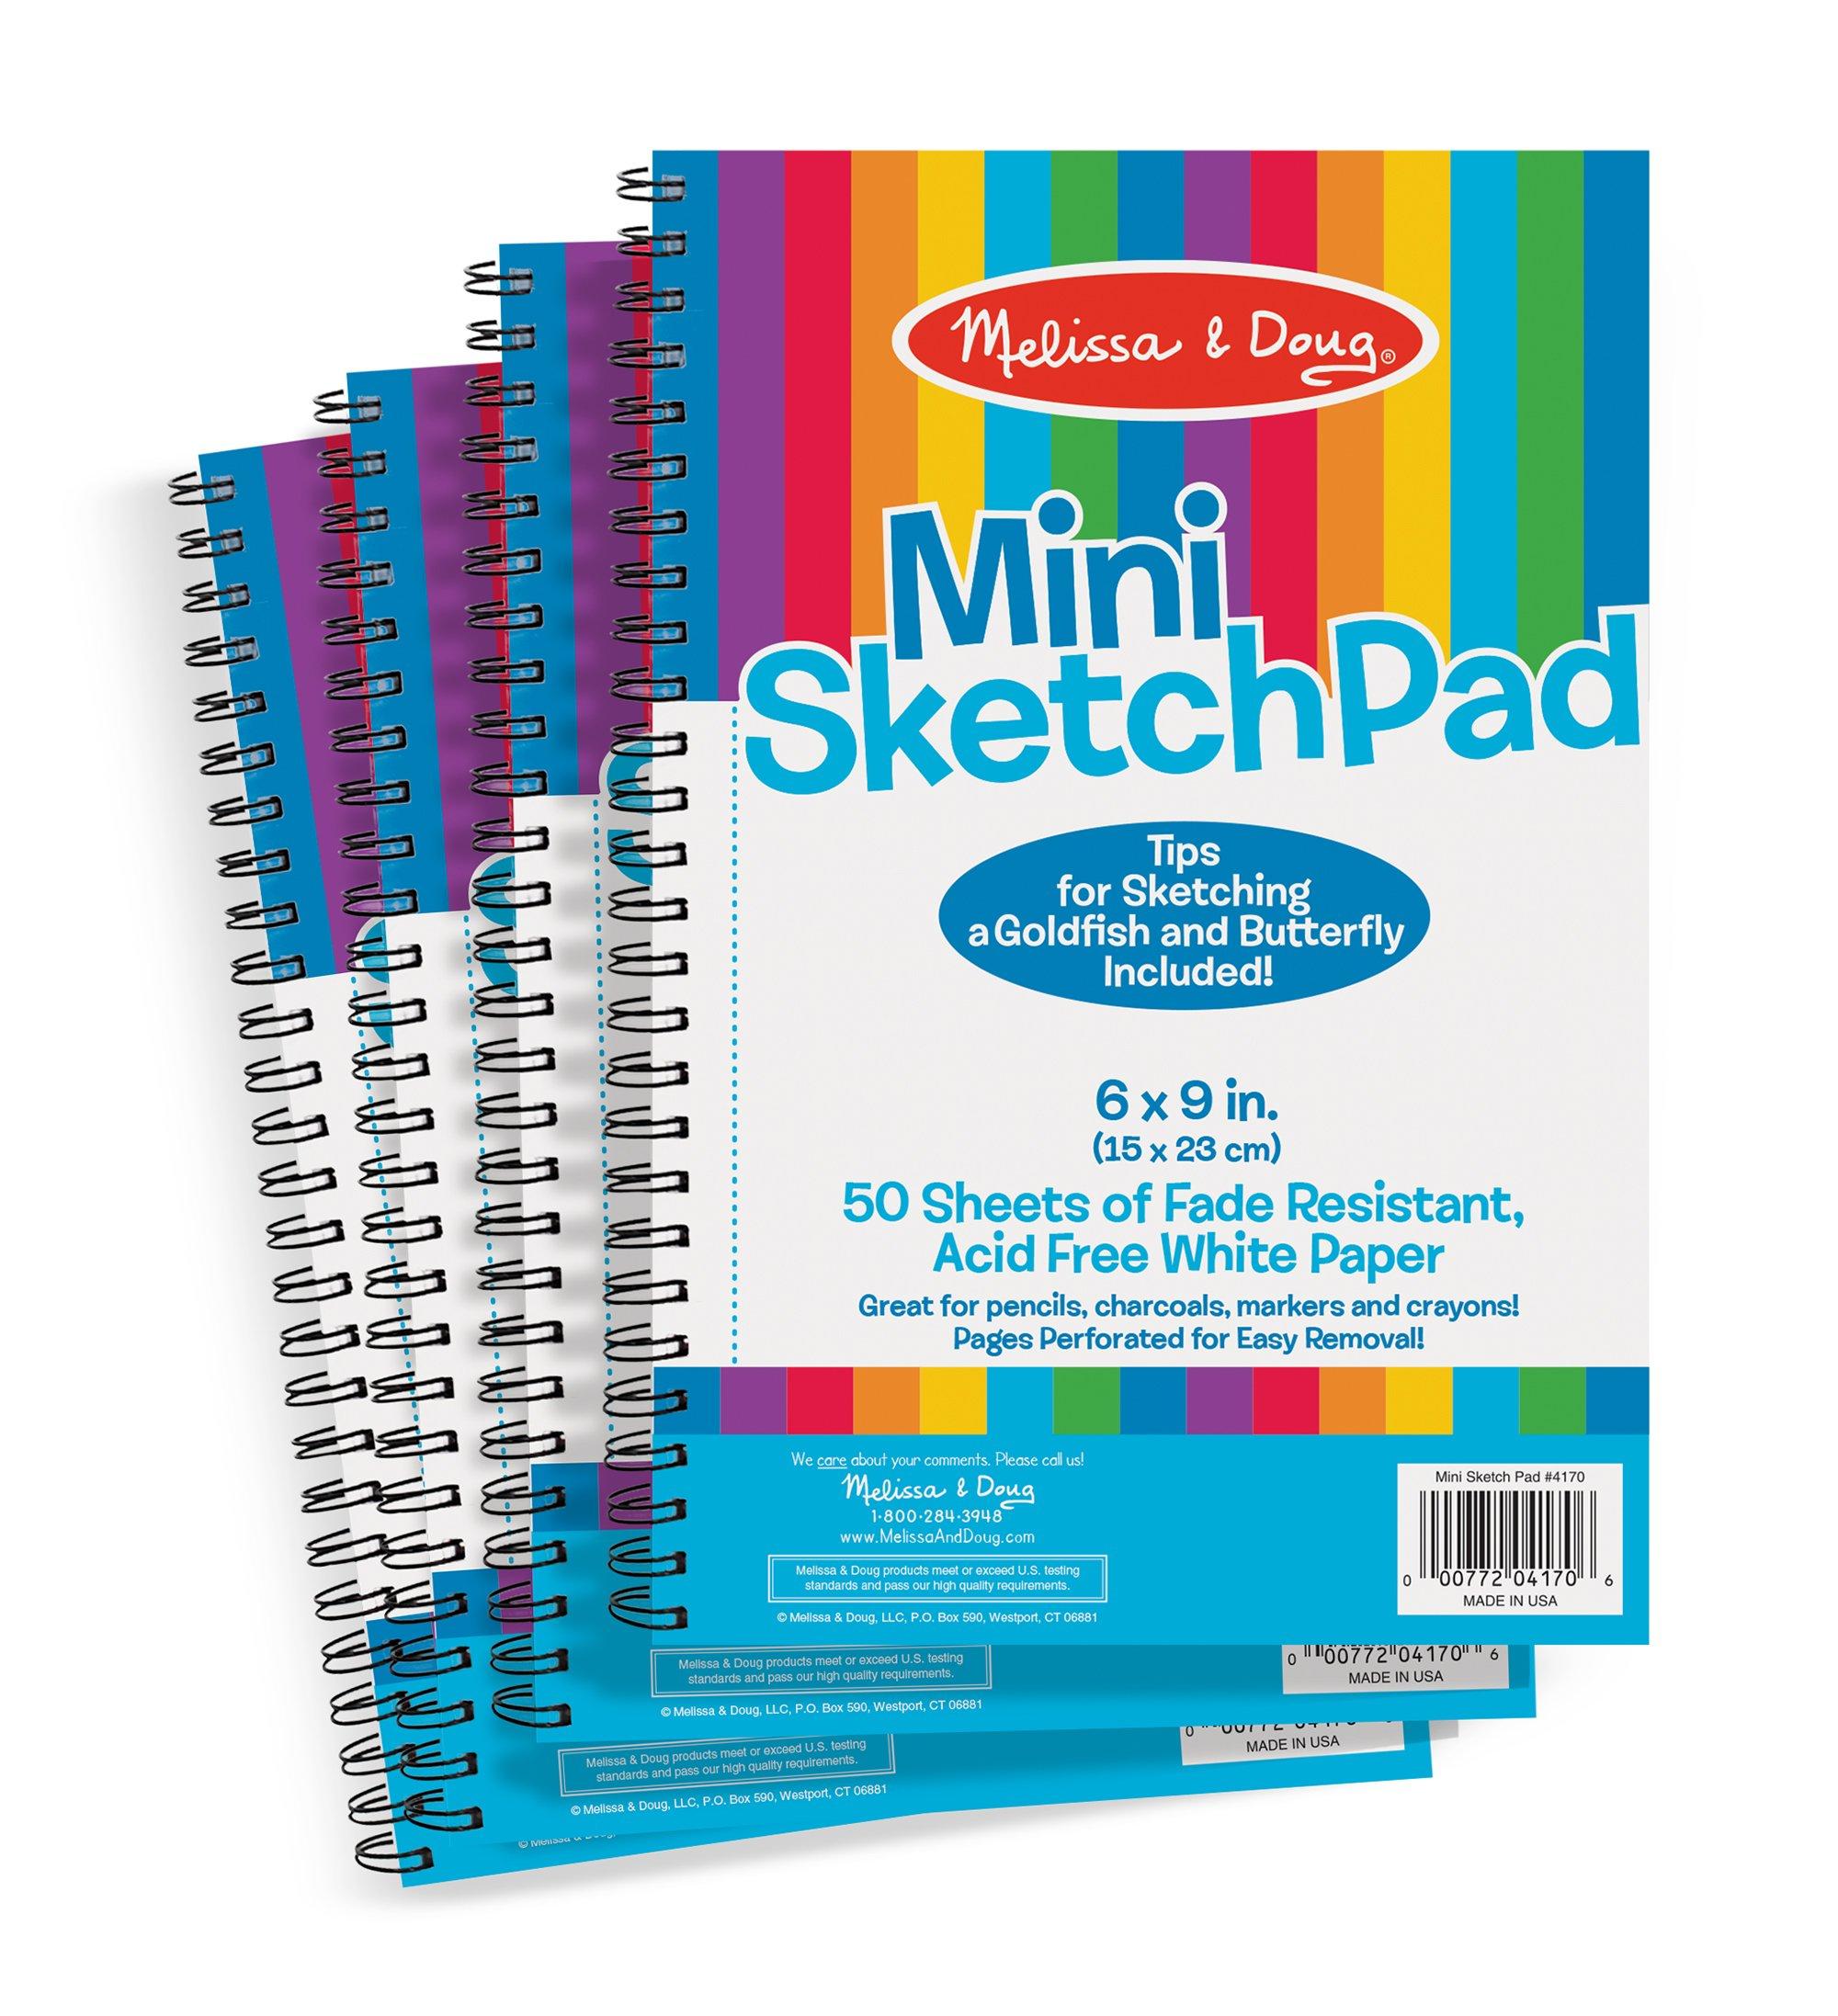 "Melissa & Doug Mini-Sketch Pads, 4-Pack (Arts & Crafts, Fade-Resistant, Acid-Free White Paper, 50 Pages, 9"" H x 6"" W x 0.25"" L)"